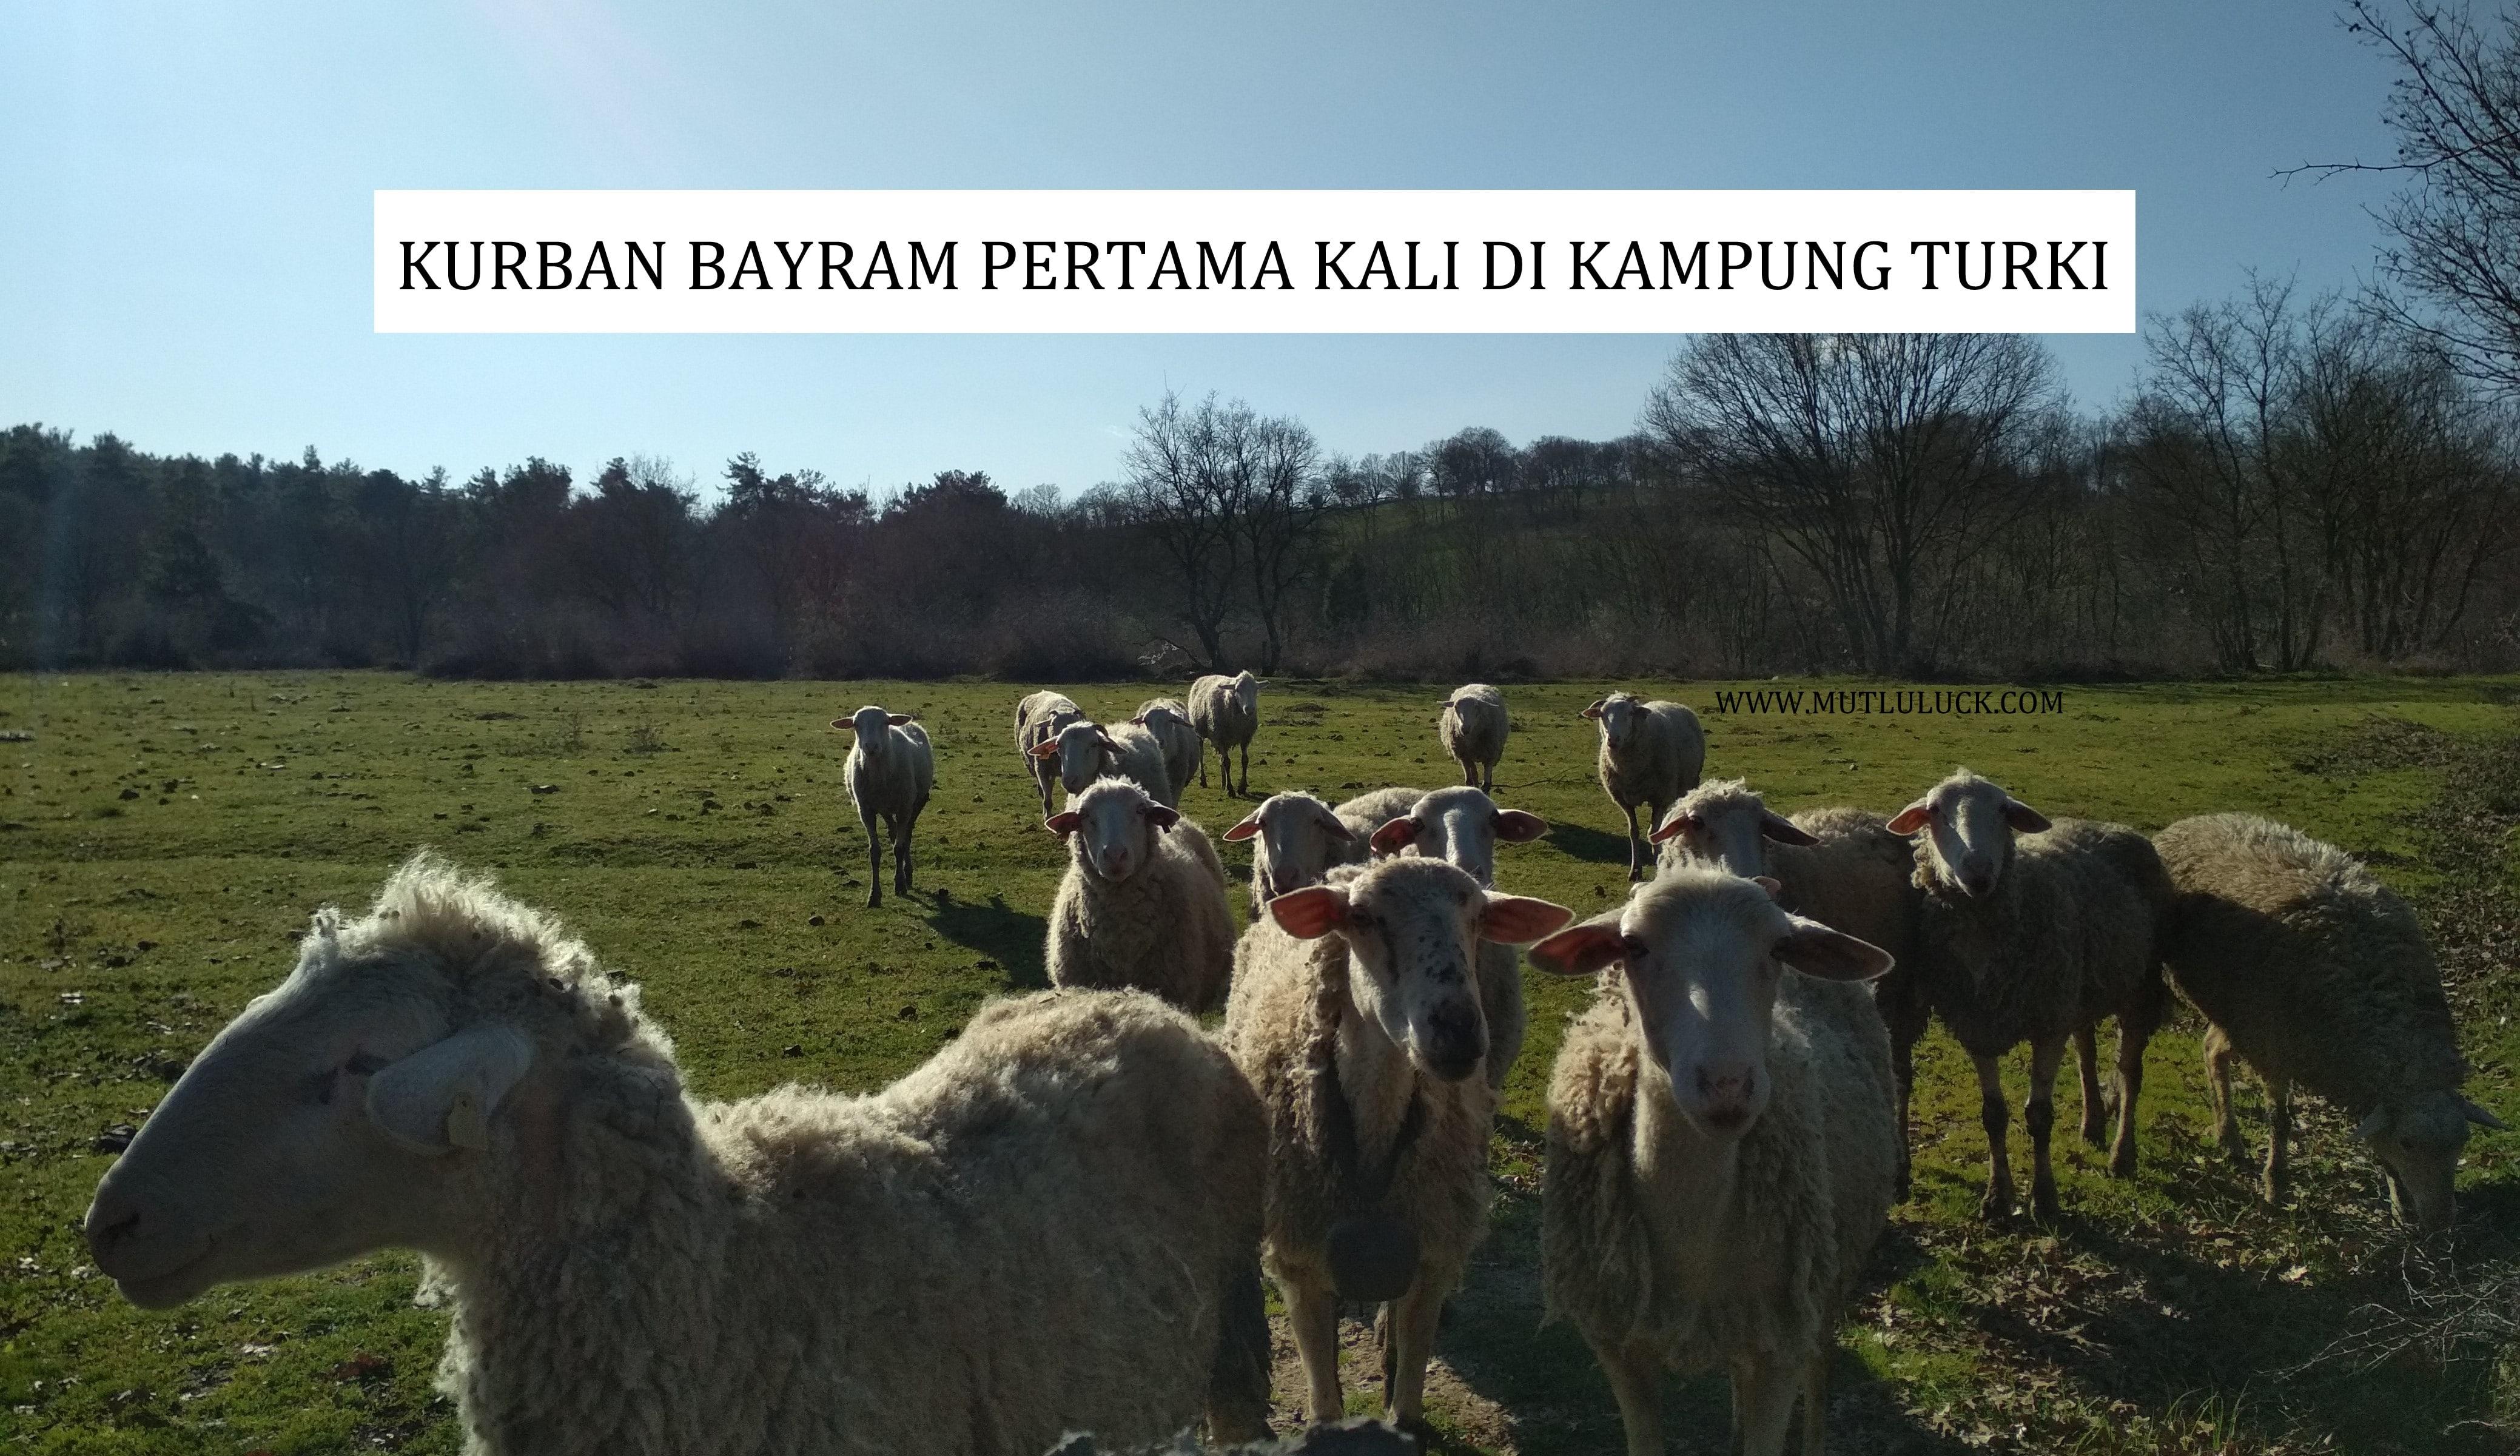 KURBAN BAYRAM PERTAMA DI TURKI